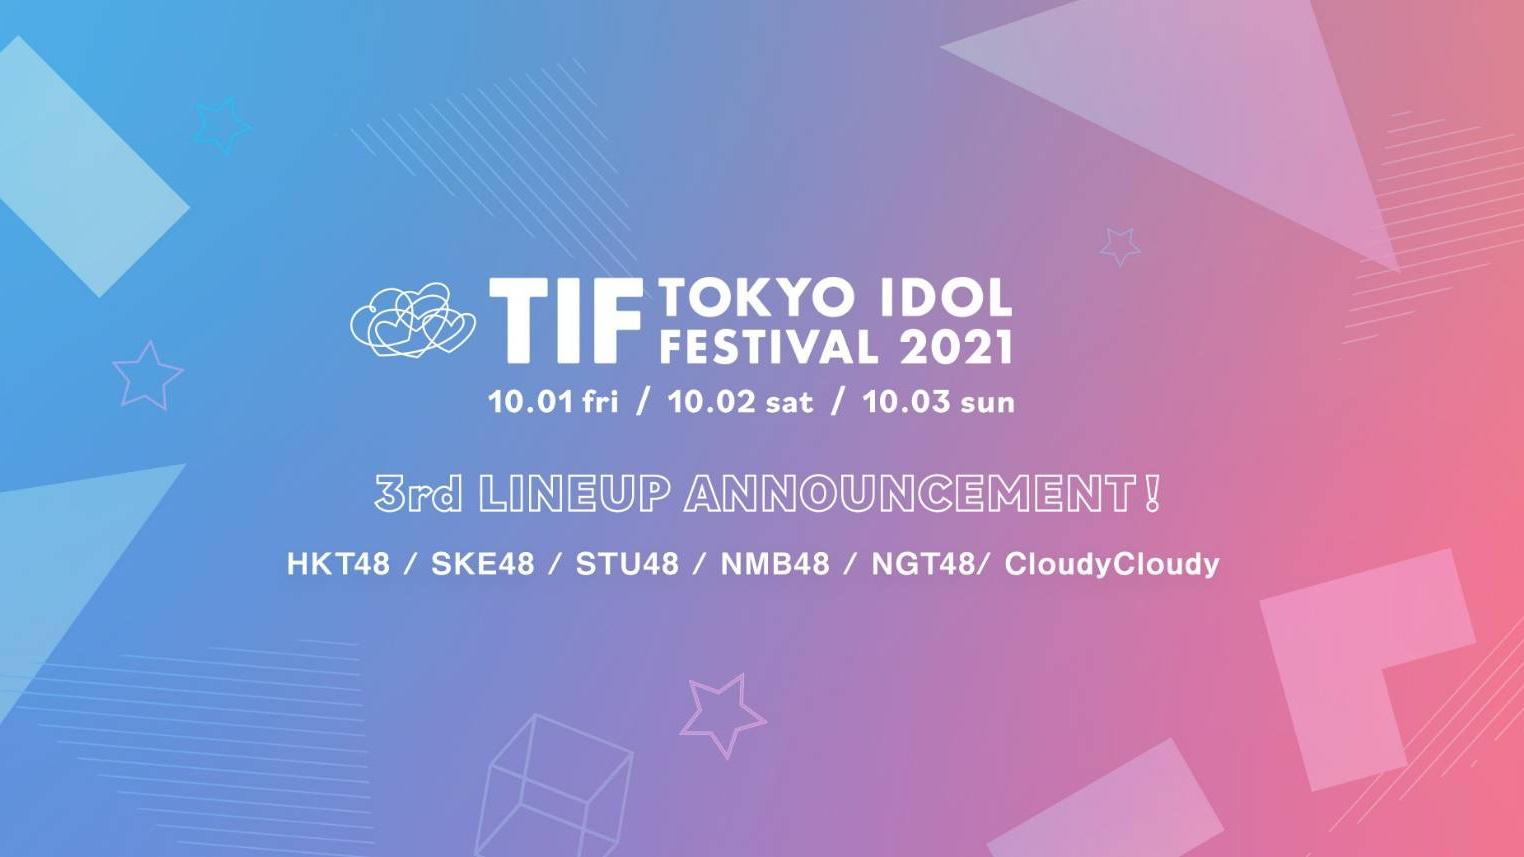 【NMB48】10⽉の「TOKYO IDOL FESTIVAL 2021」に出演